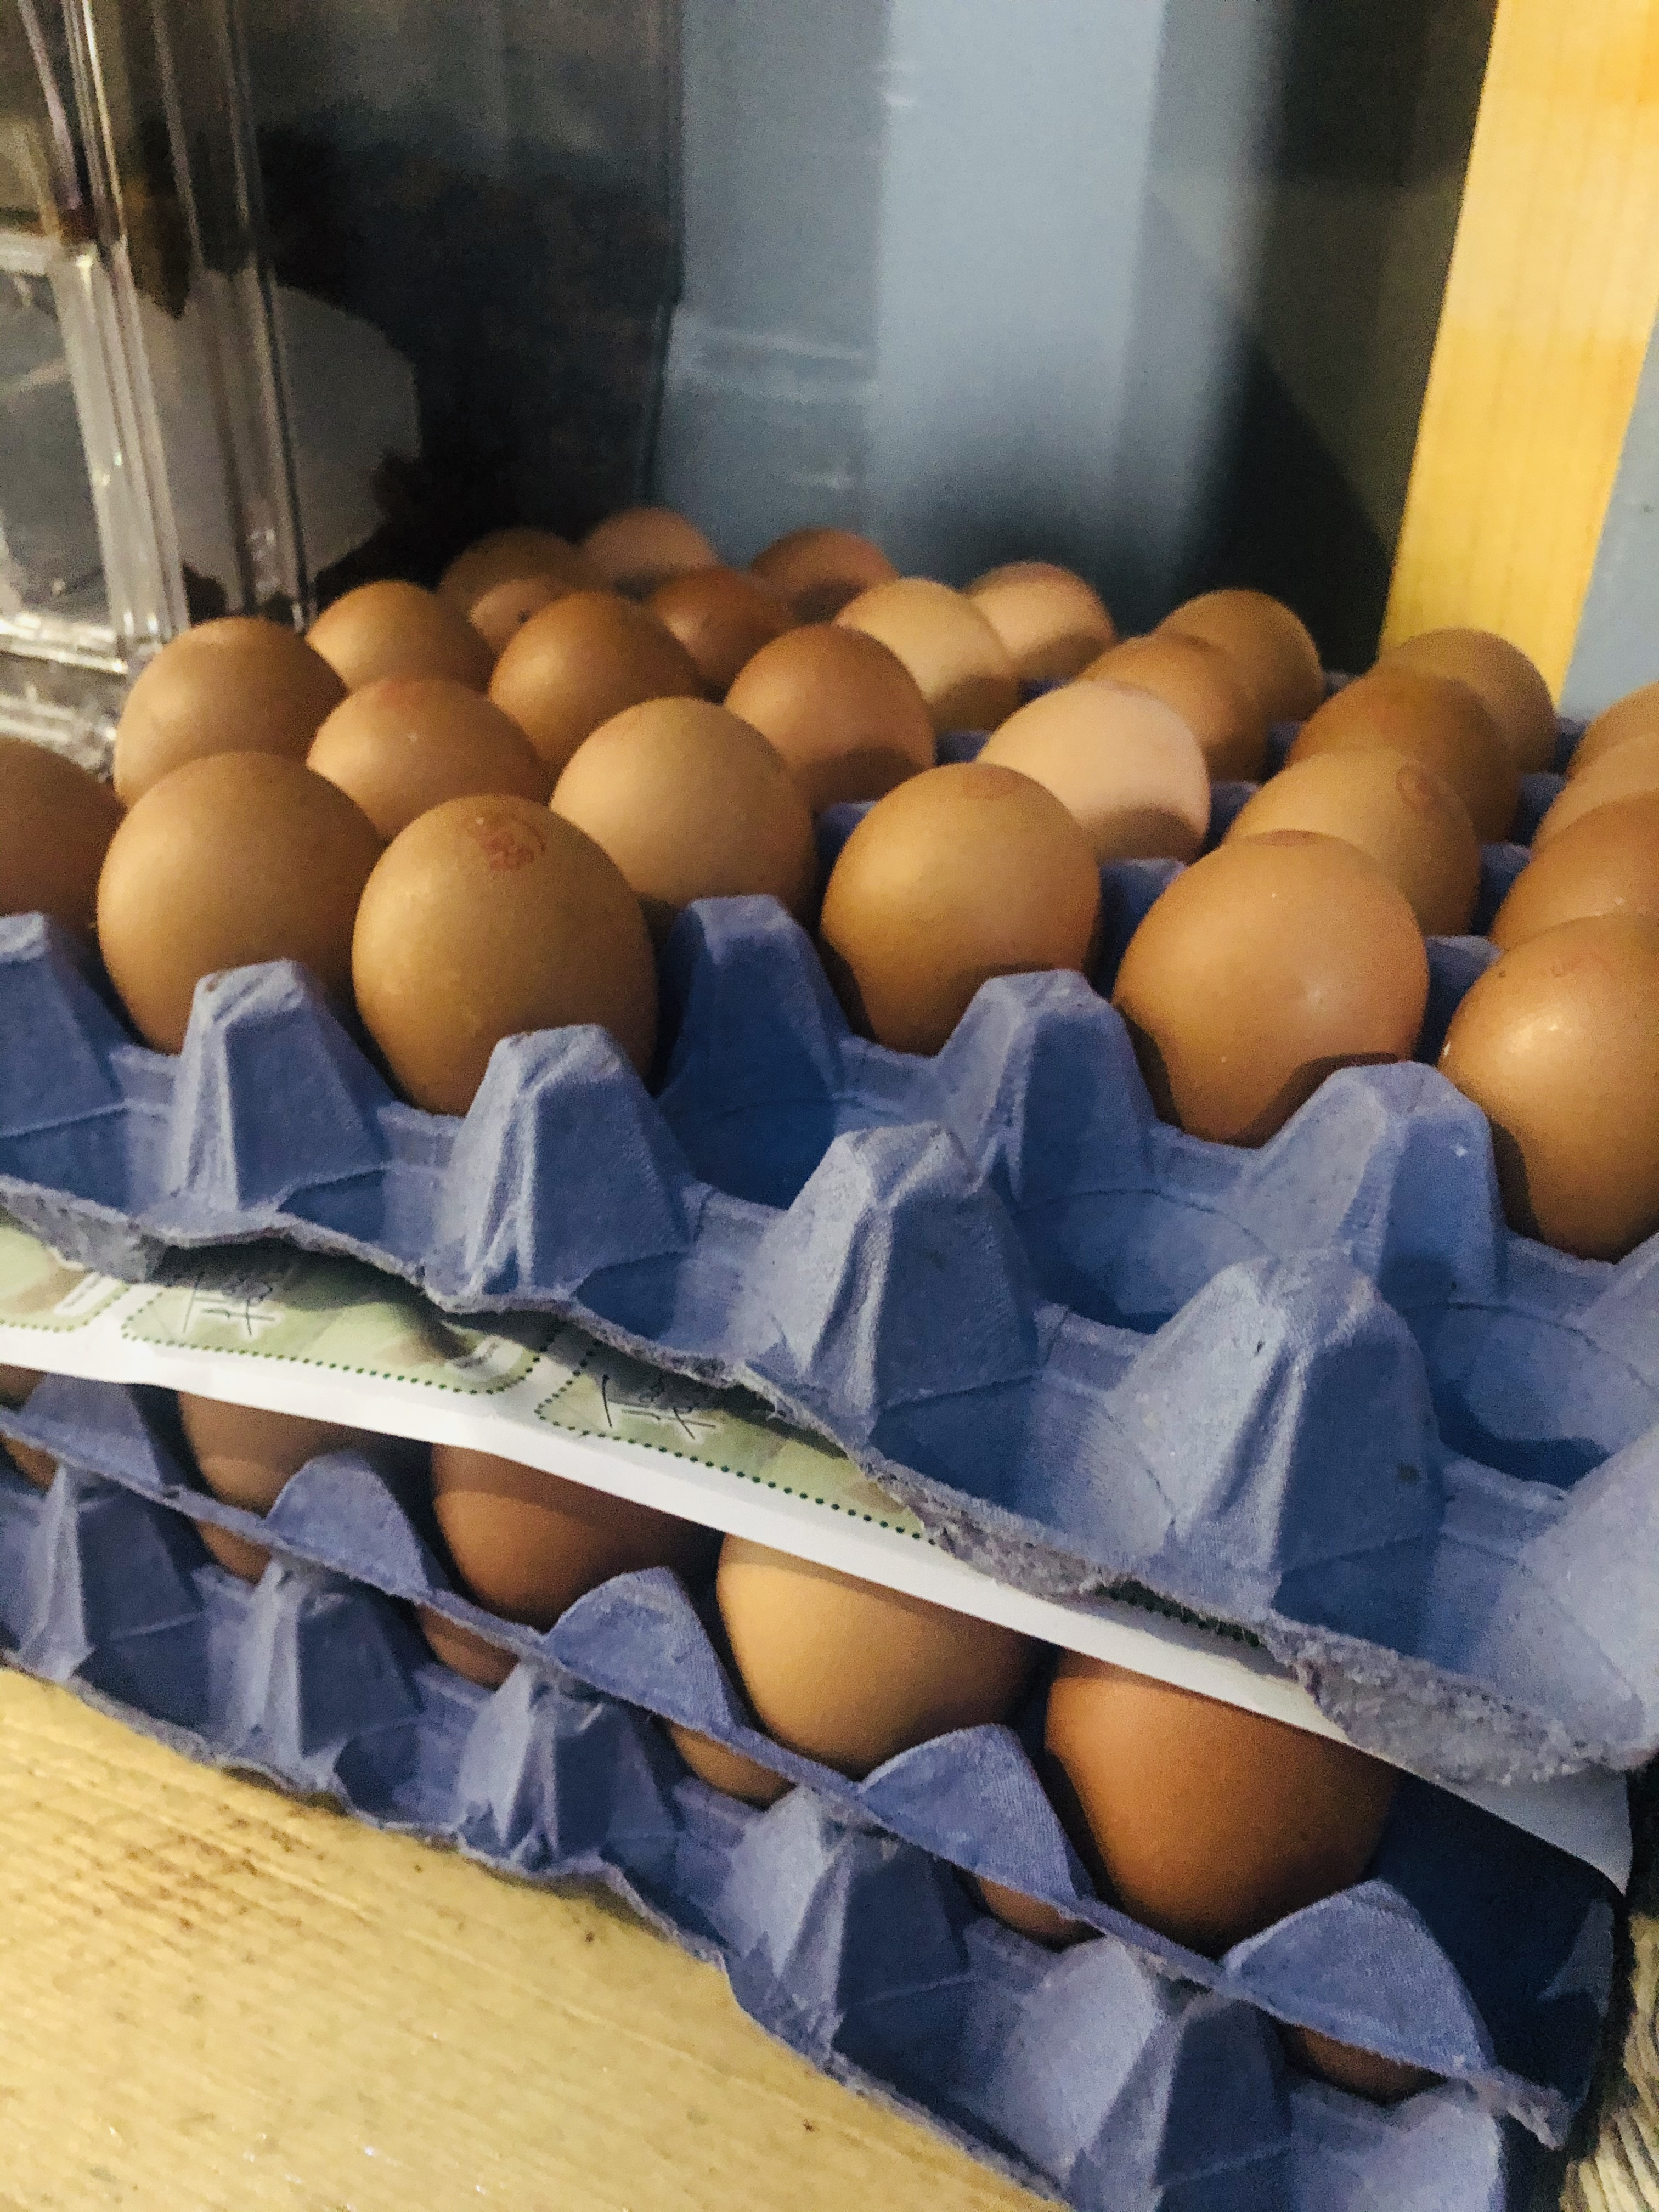 Eggs (Townhead Farm)(6)